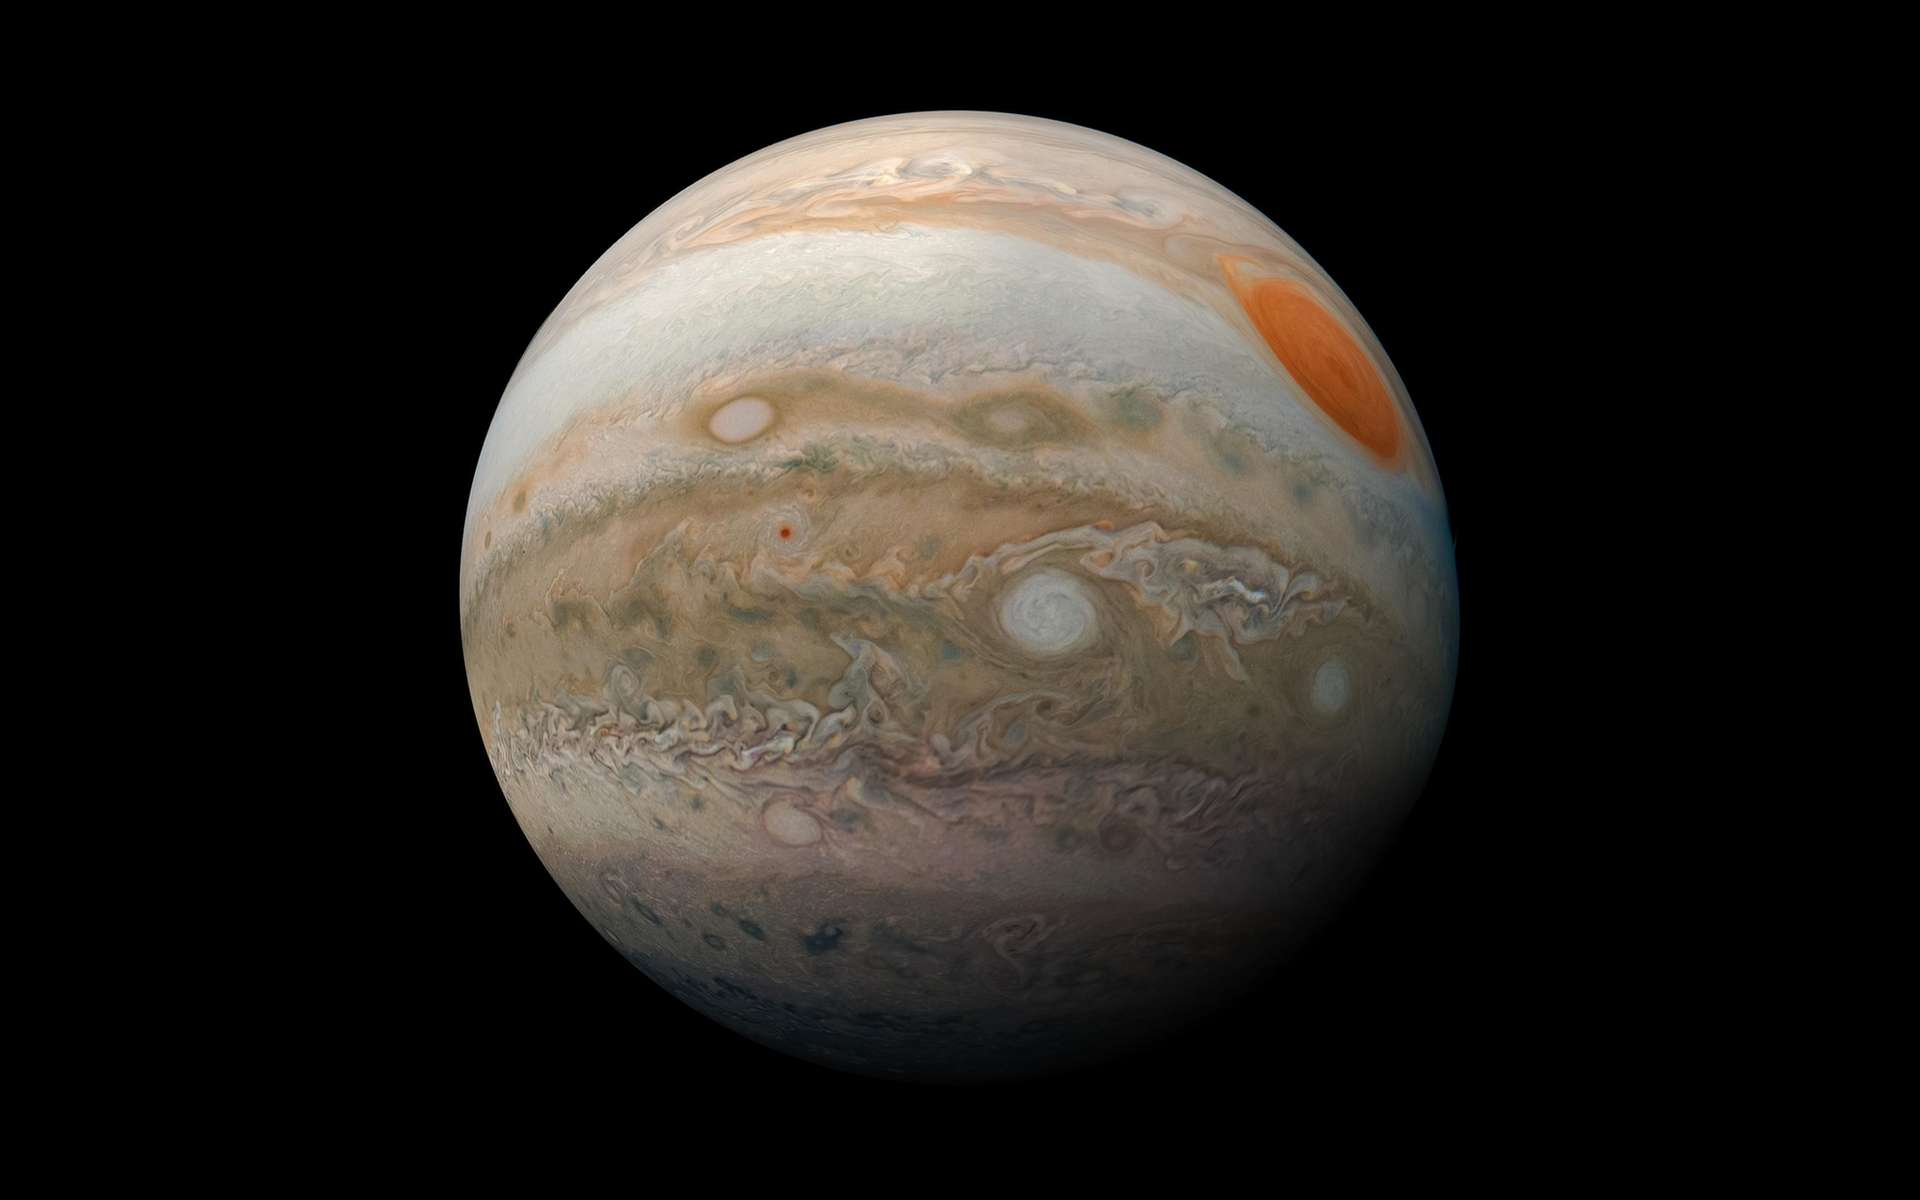 Jupiter photographiée par la sonde Juno. © Nasa, JPL-Caltech, SwRI, MSSS, Kevin M. Gill